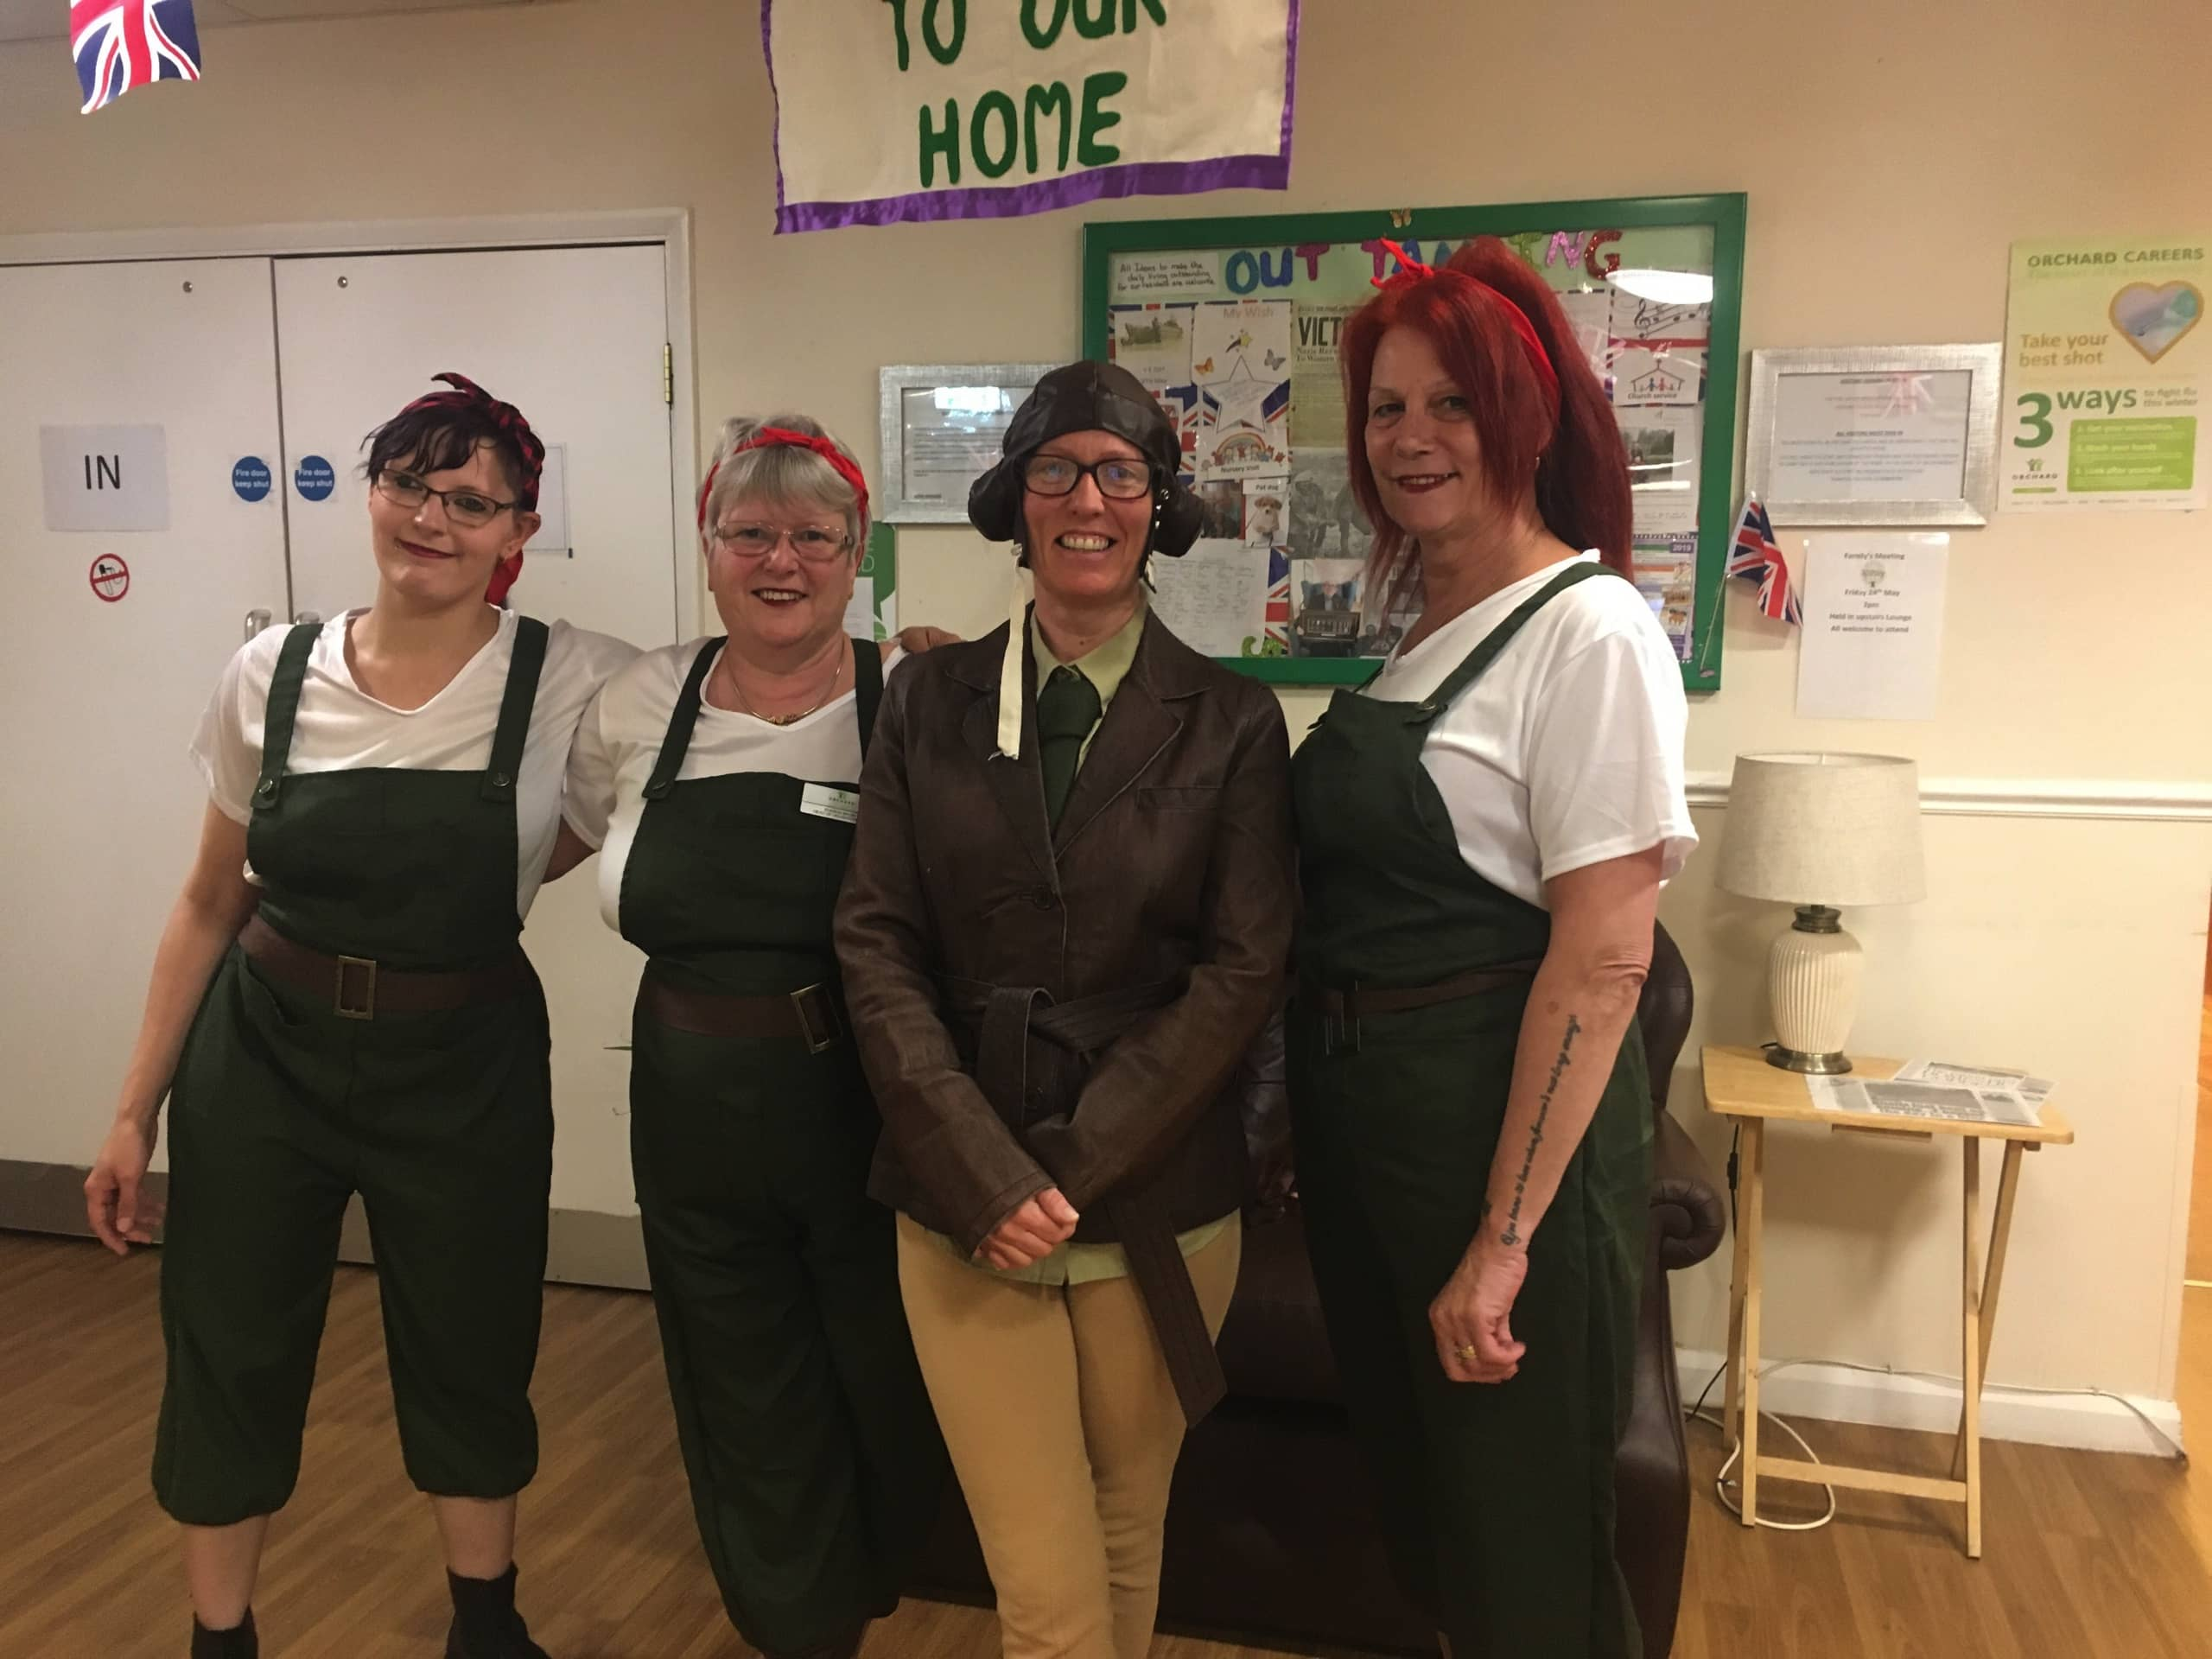 Staff at Chatsworth Lodge dressed as Land Girls.